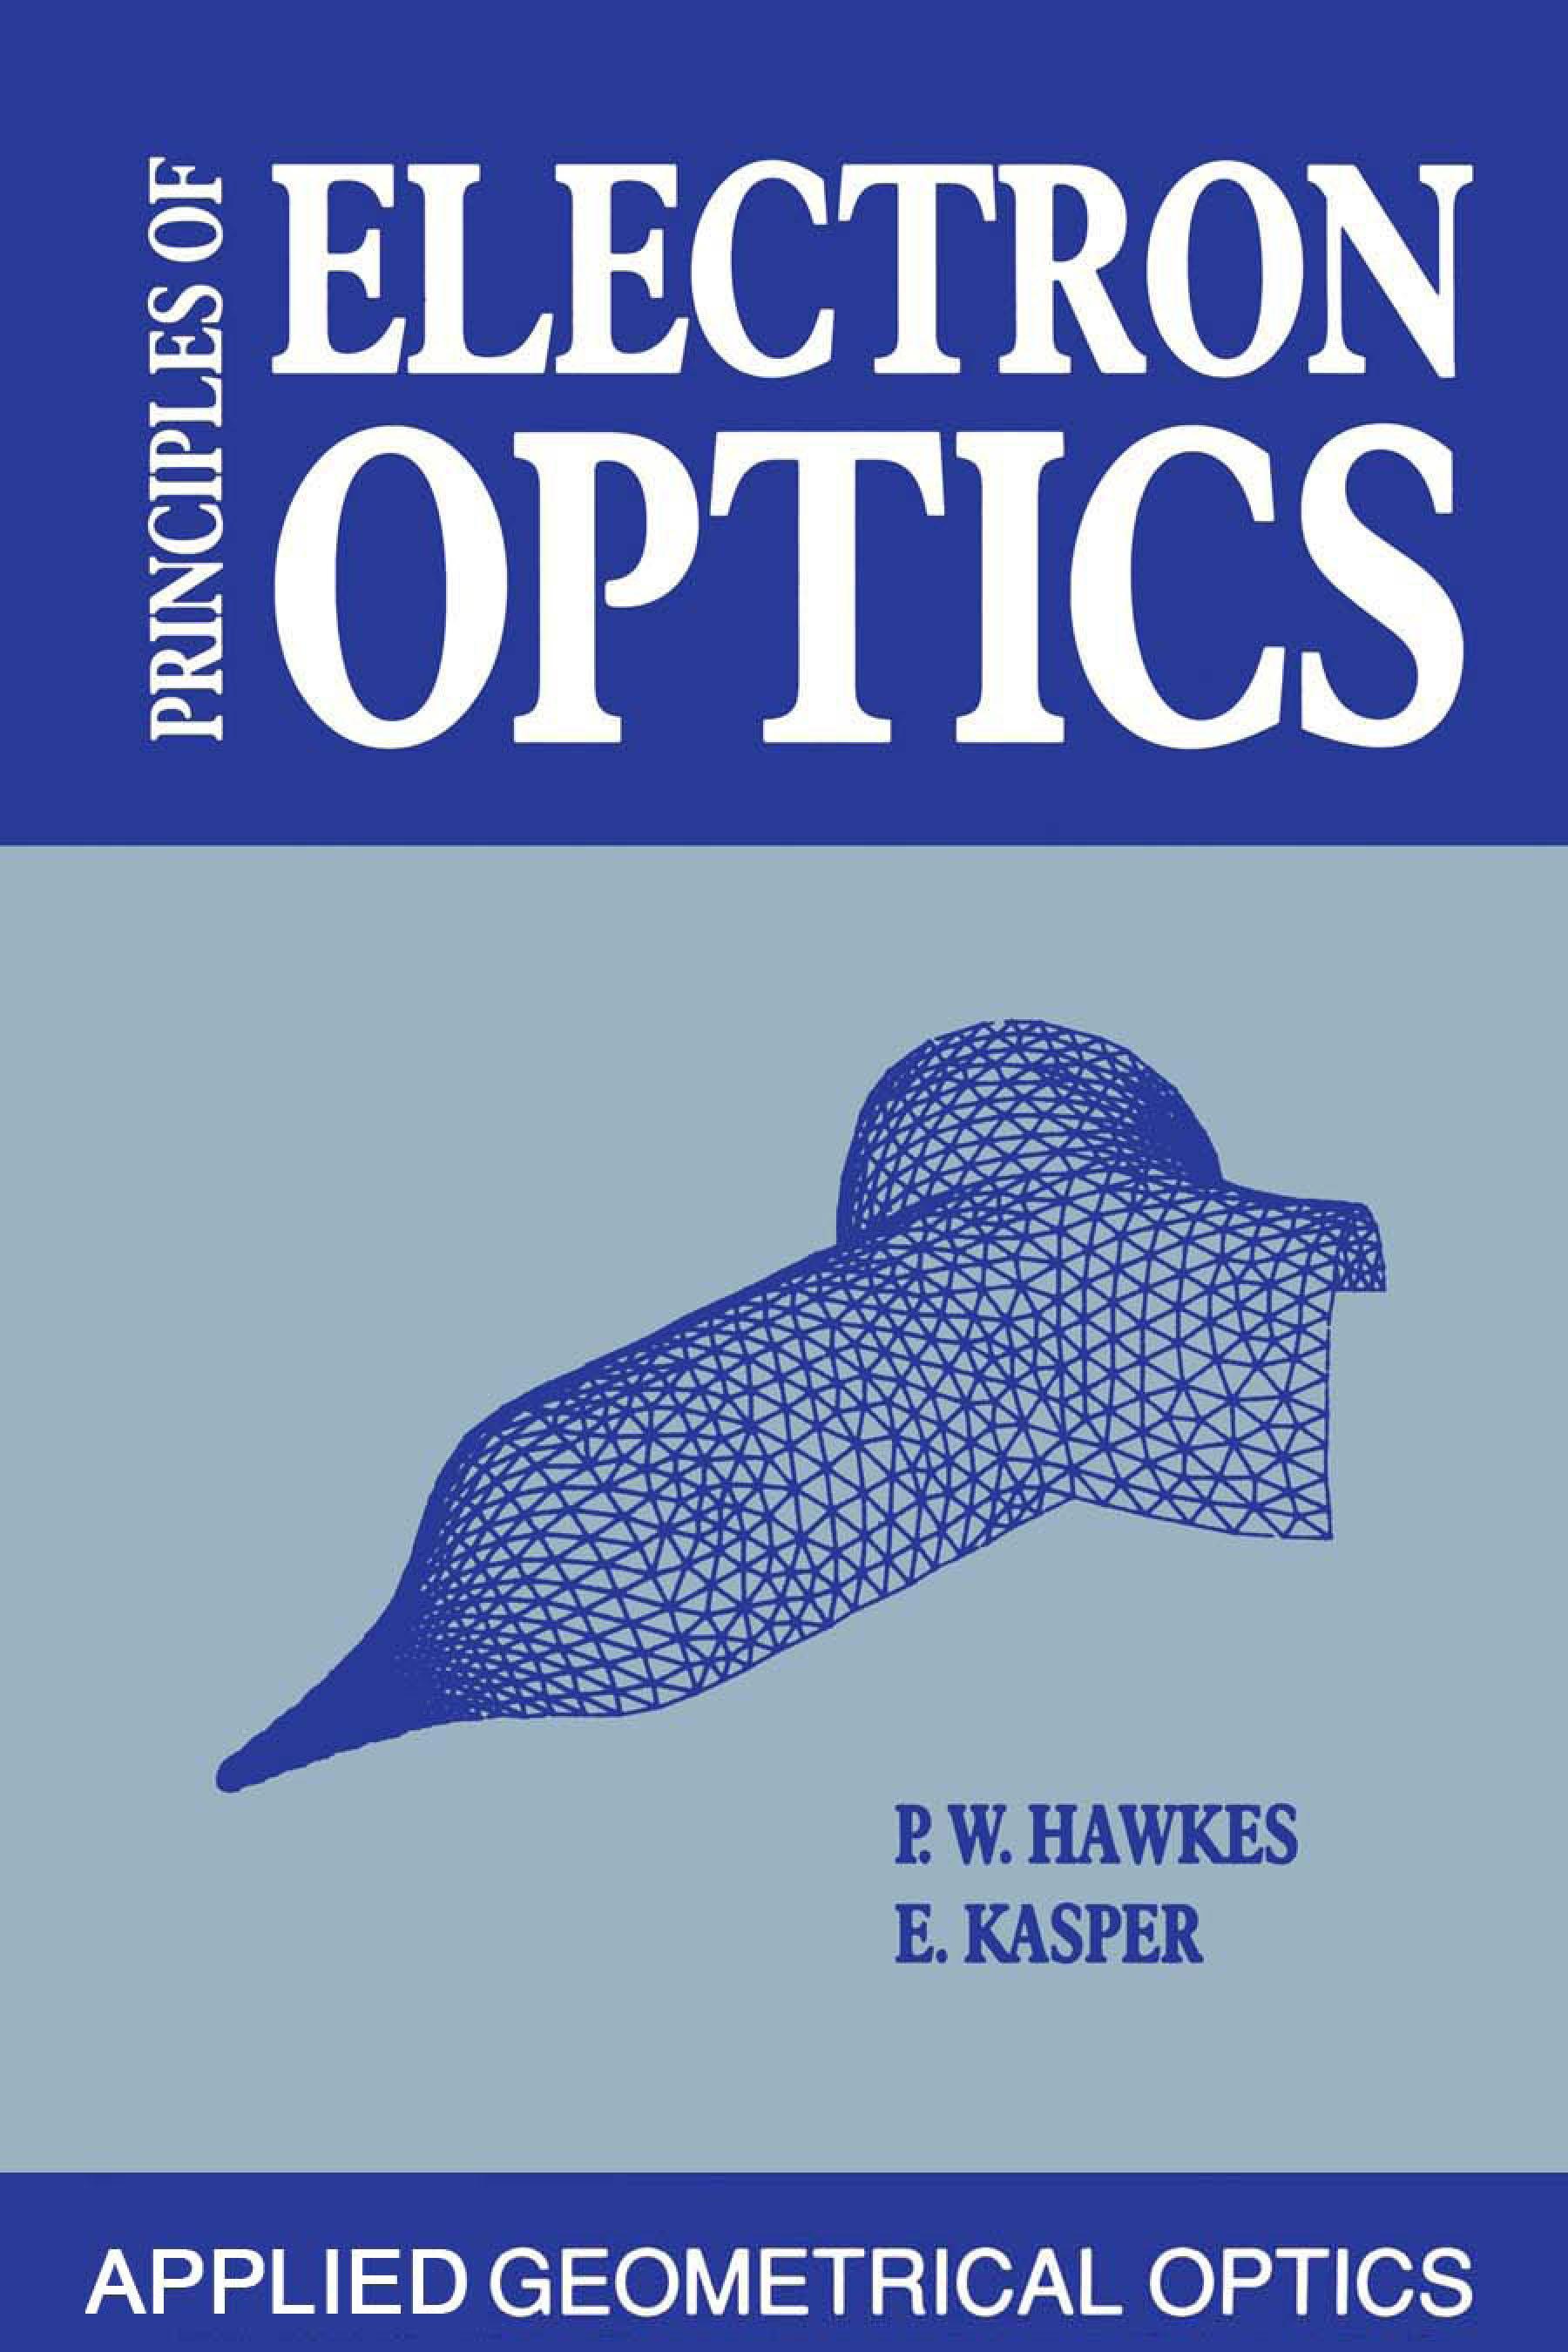 Principles of Electron Optics: Applied Geometrical Optics EB9780080962436